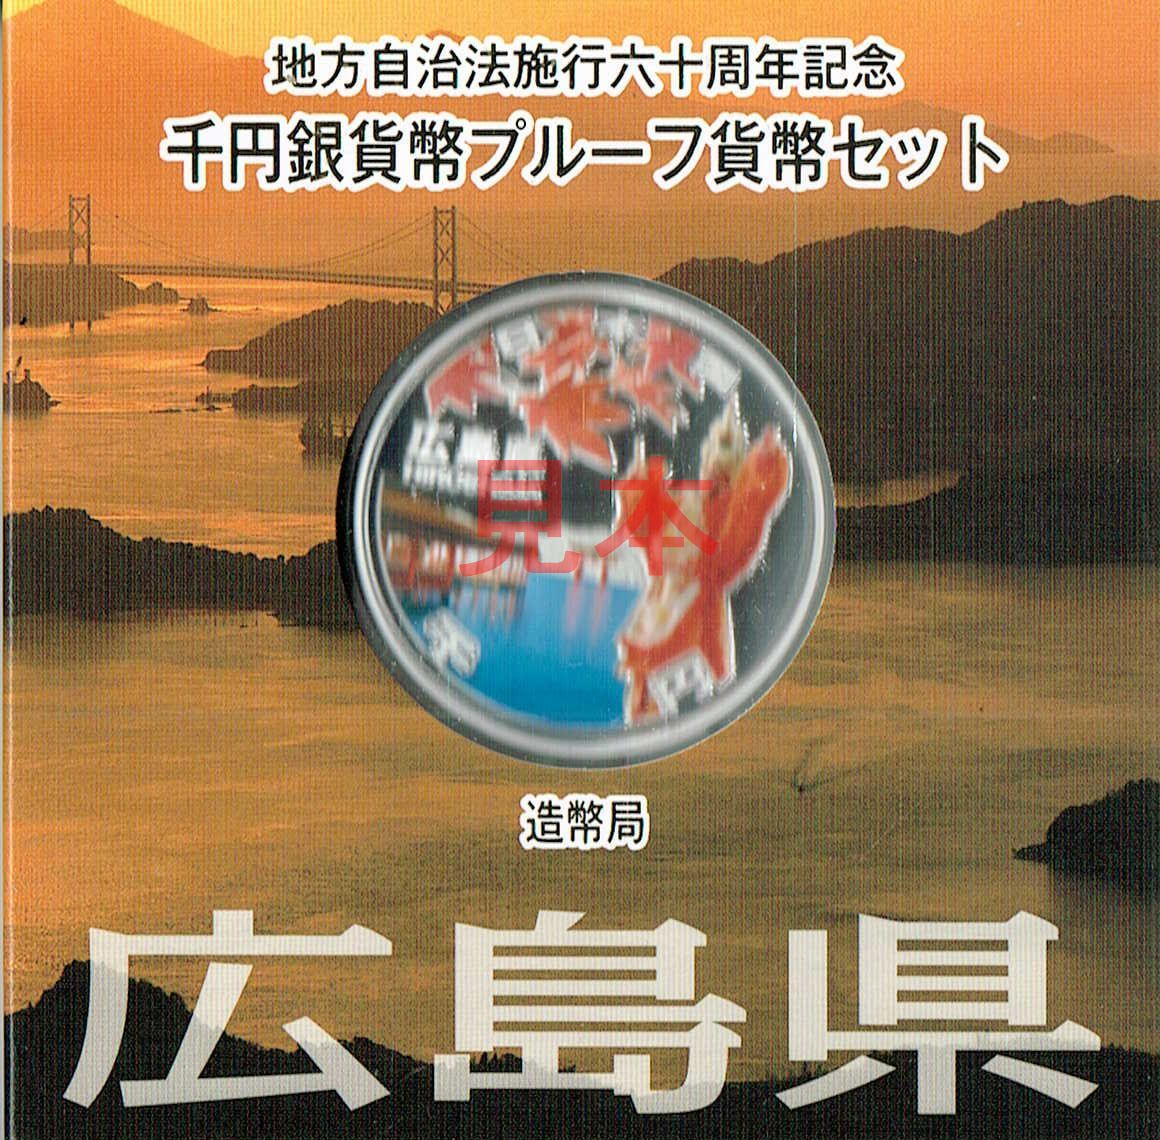 商品名「地方自治法施行60周年記念千円銀貨幣プルーフ Aセット 広島県」